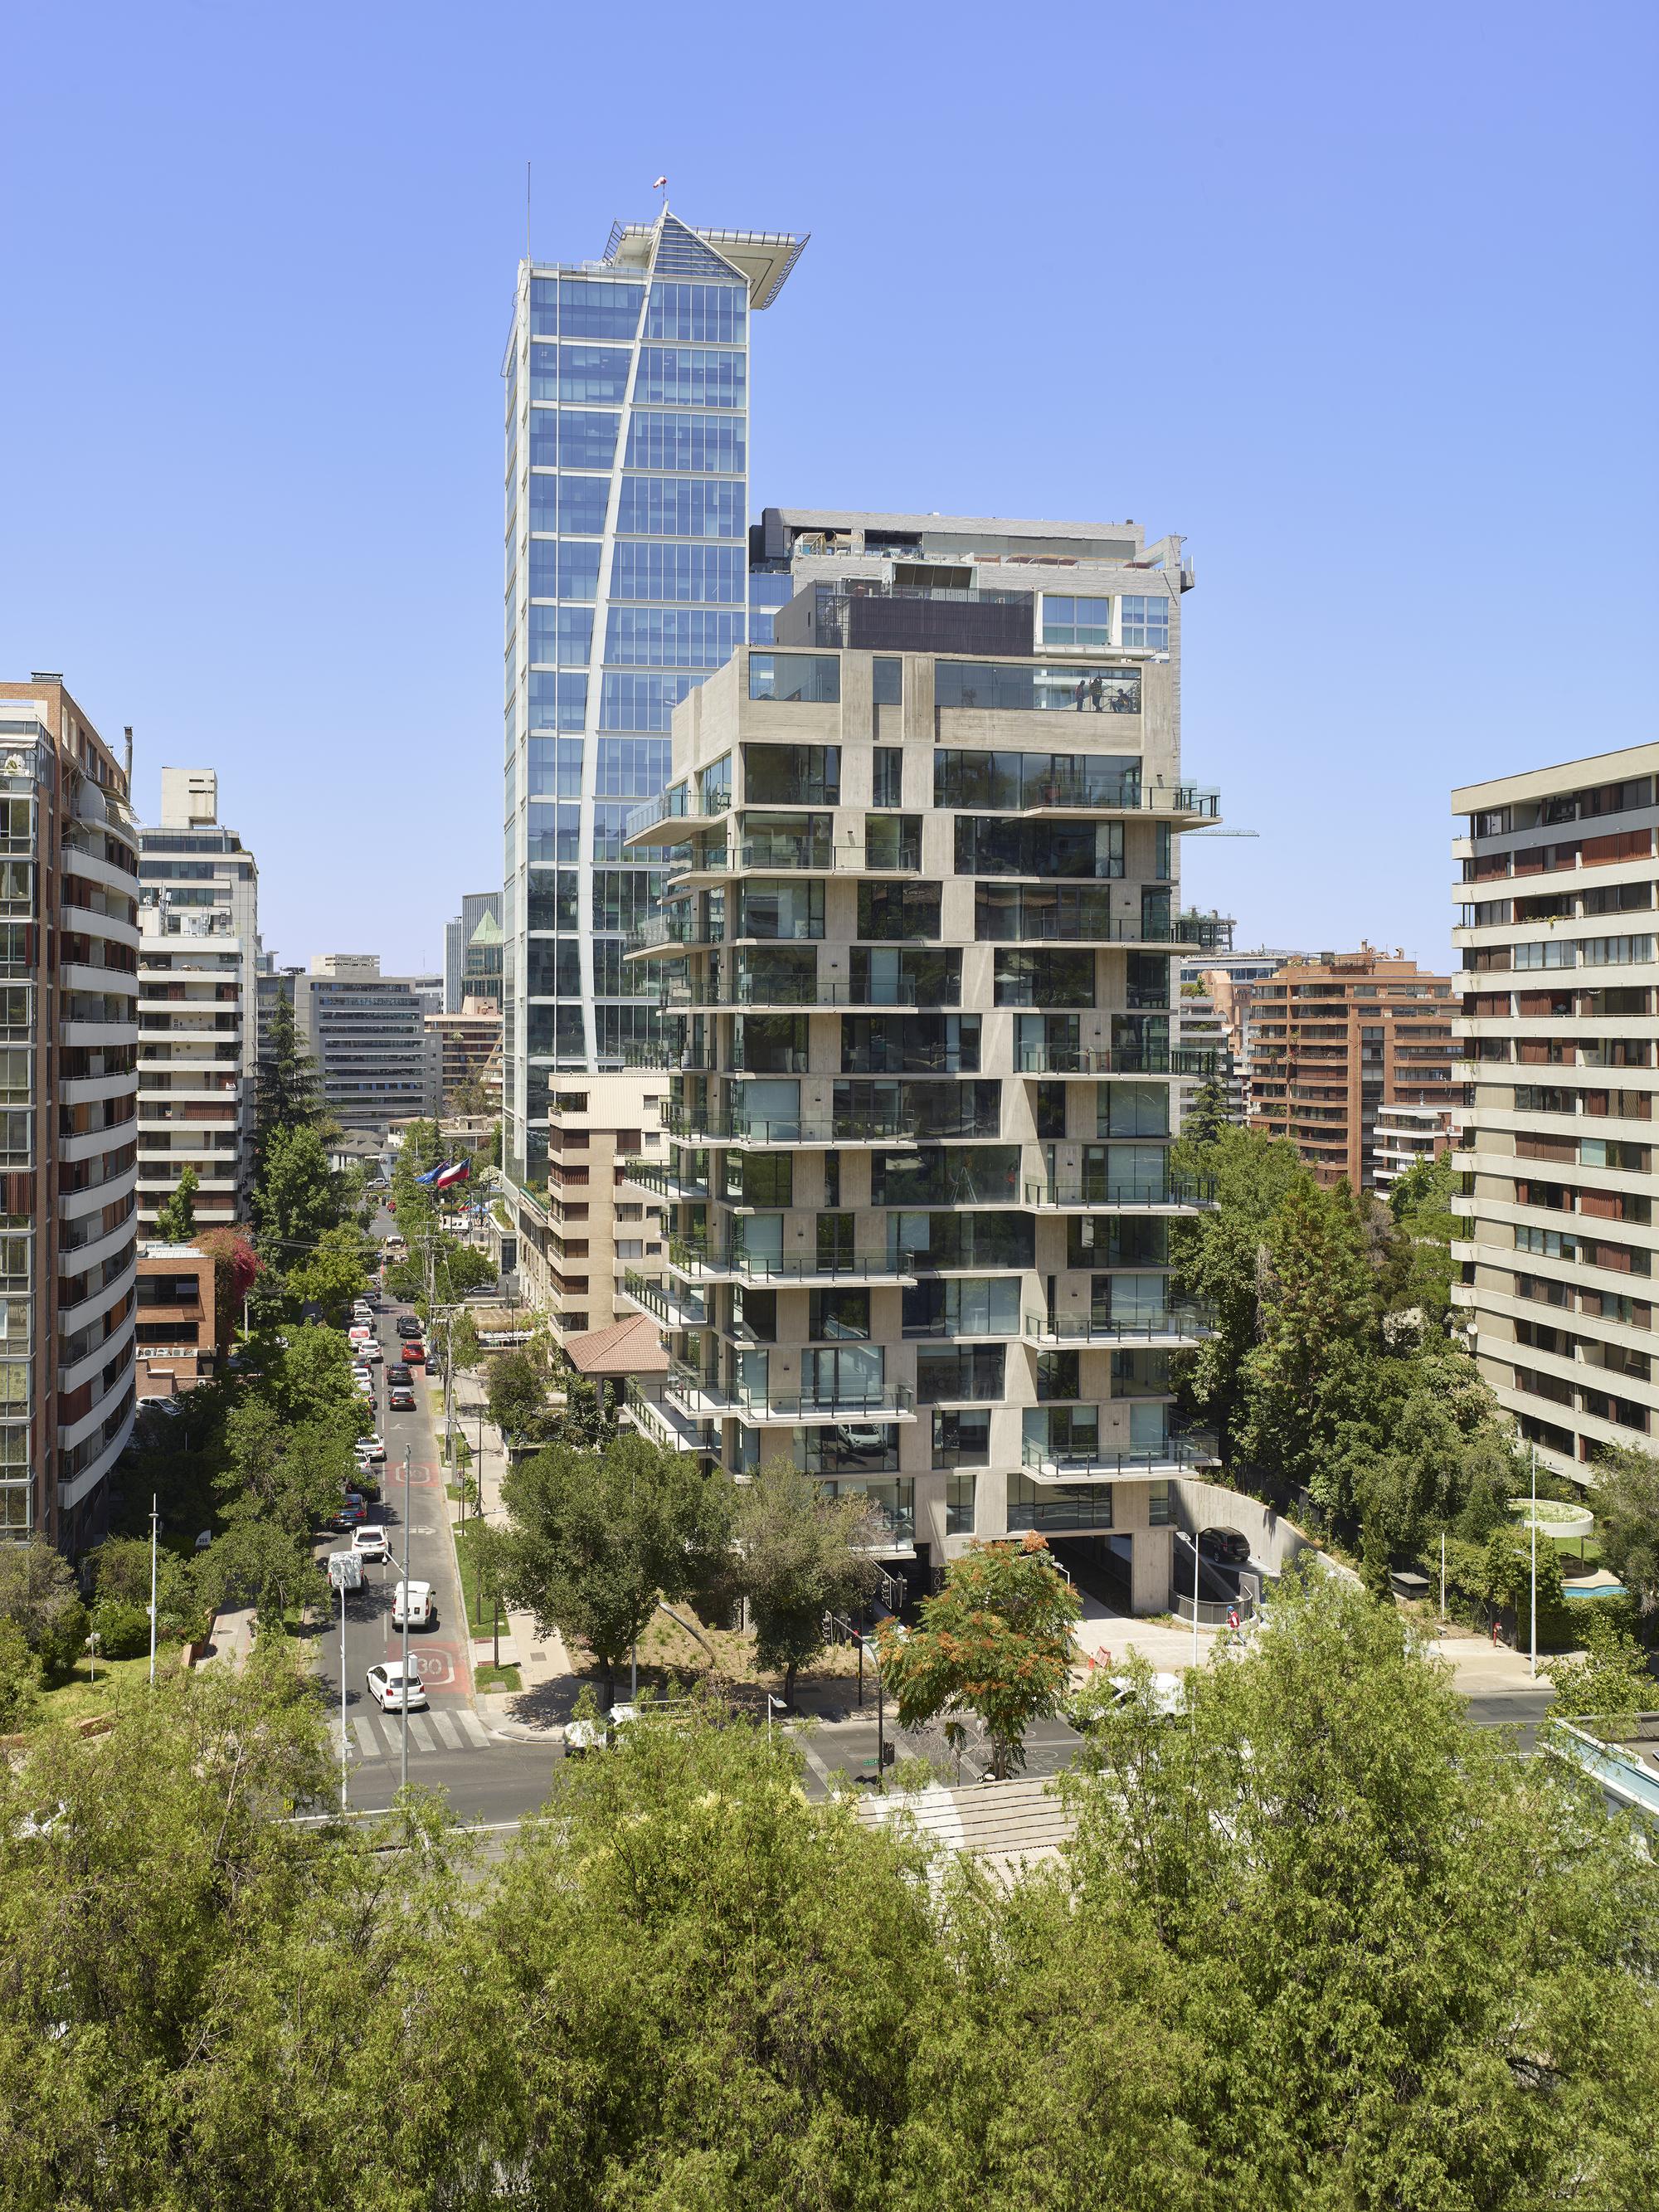 Edificio Riesco Leguia / ValdesHagemann